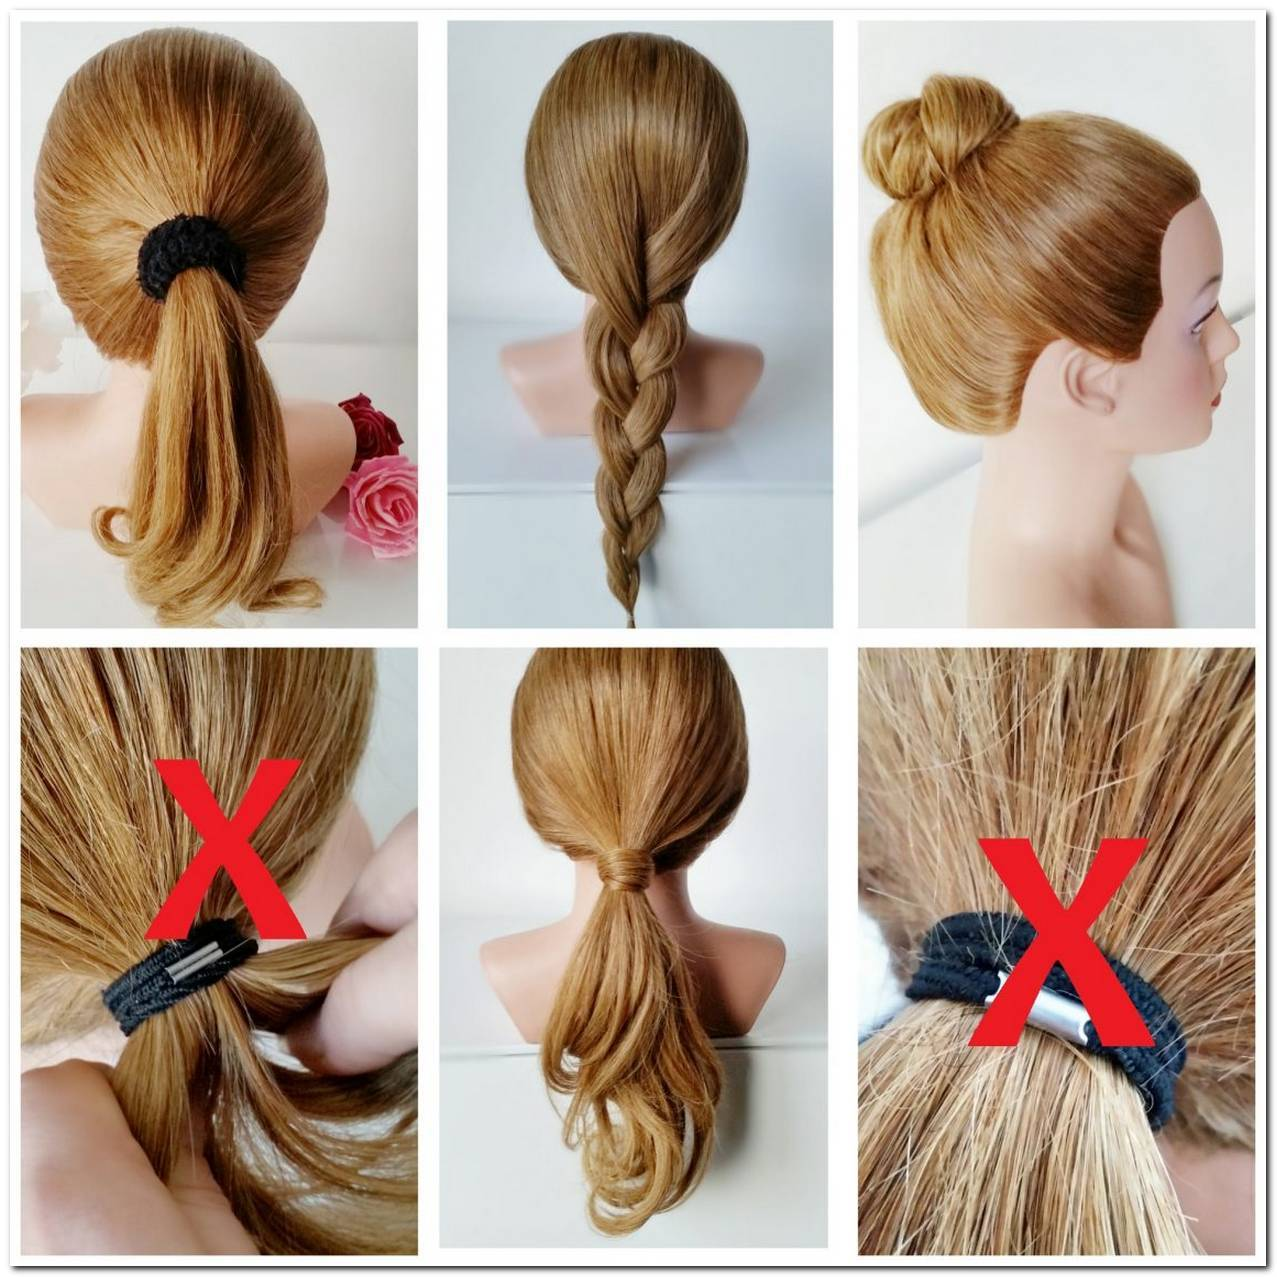 Frisuren Bei Haarbruch